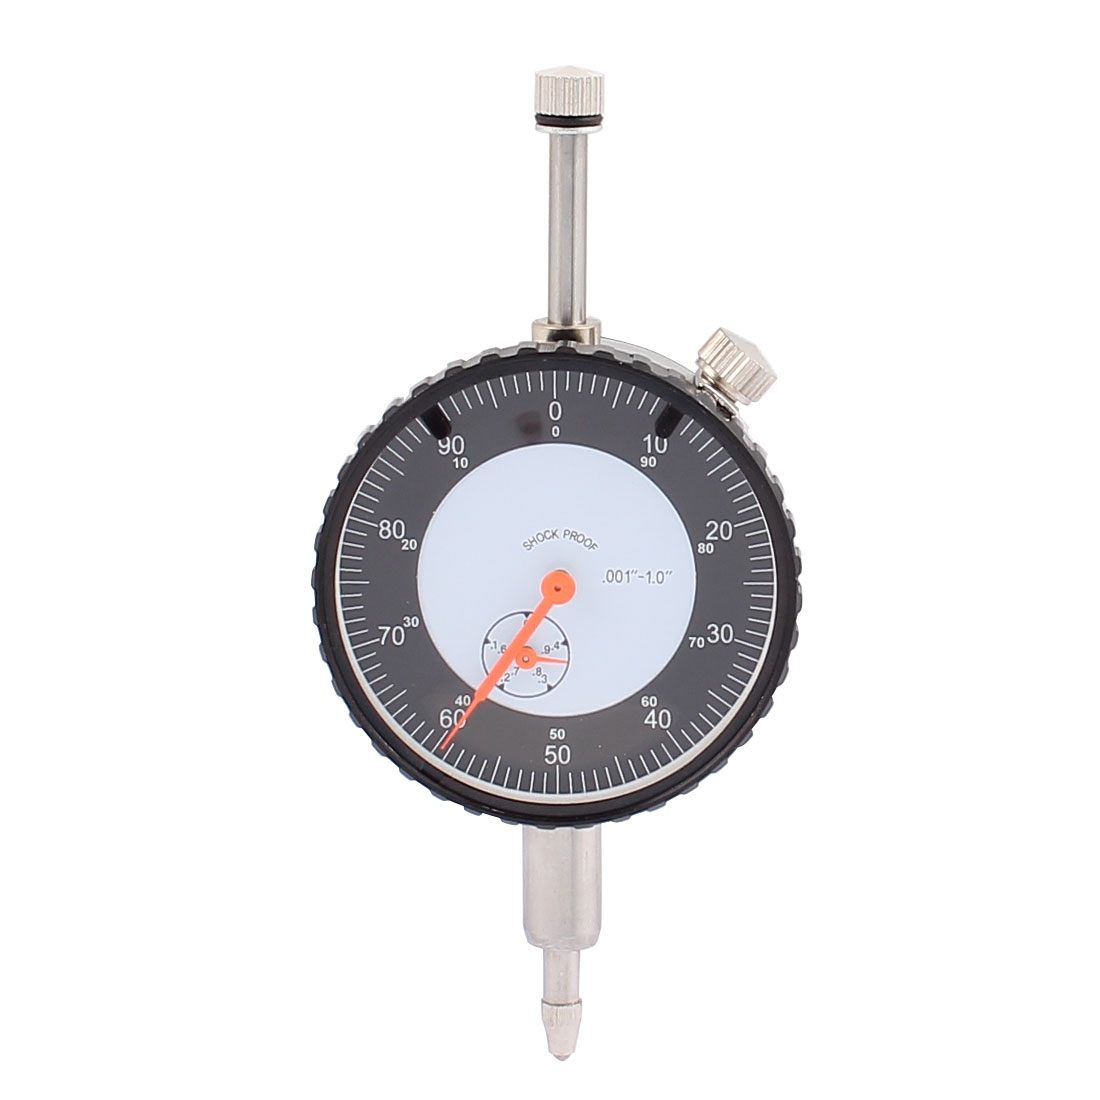 0-1inch Range Measurement Instrument Dial Indicator Gauge Precision Tool B-01